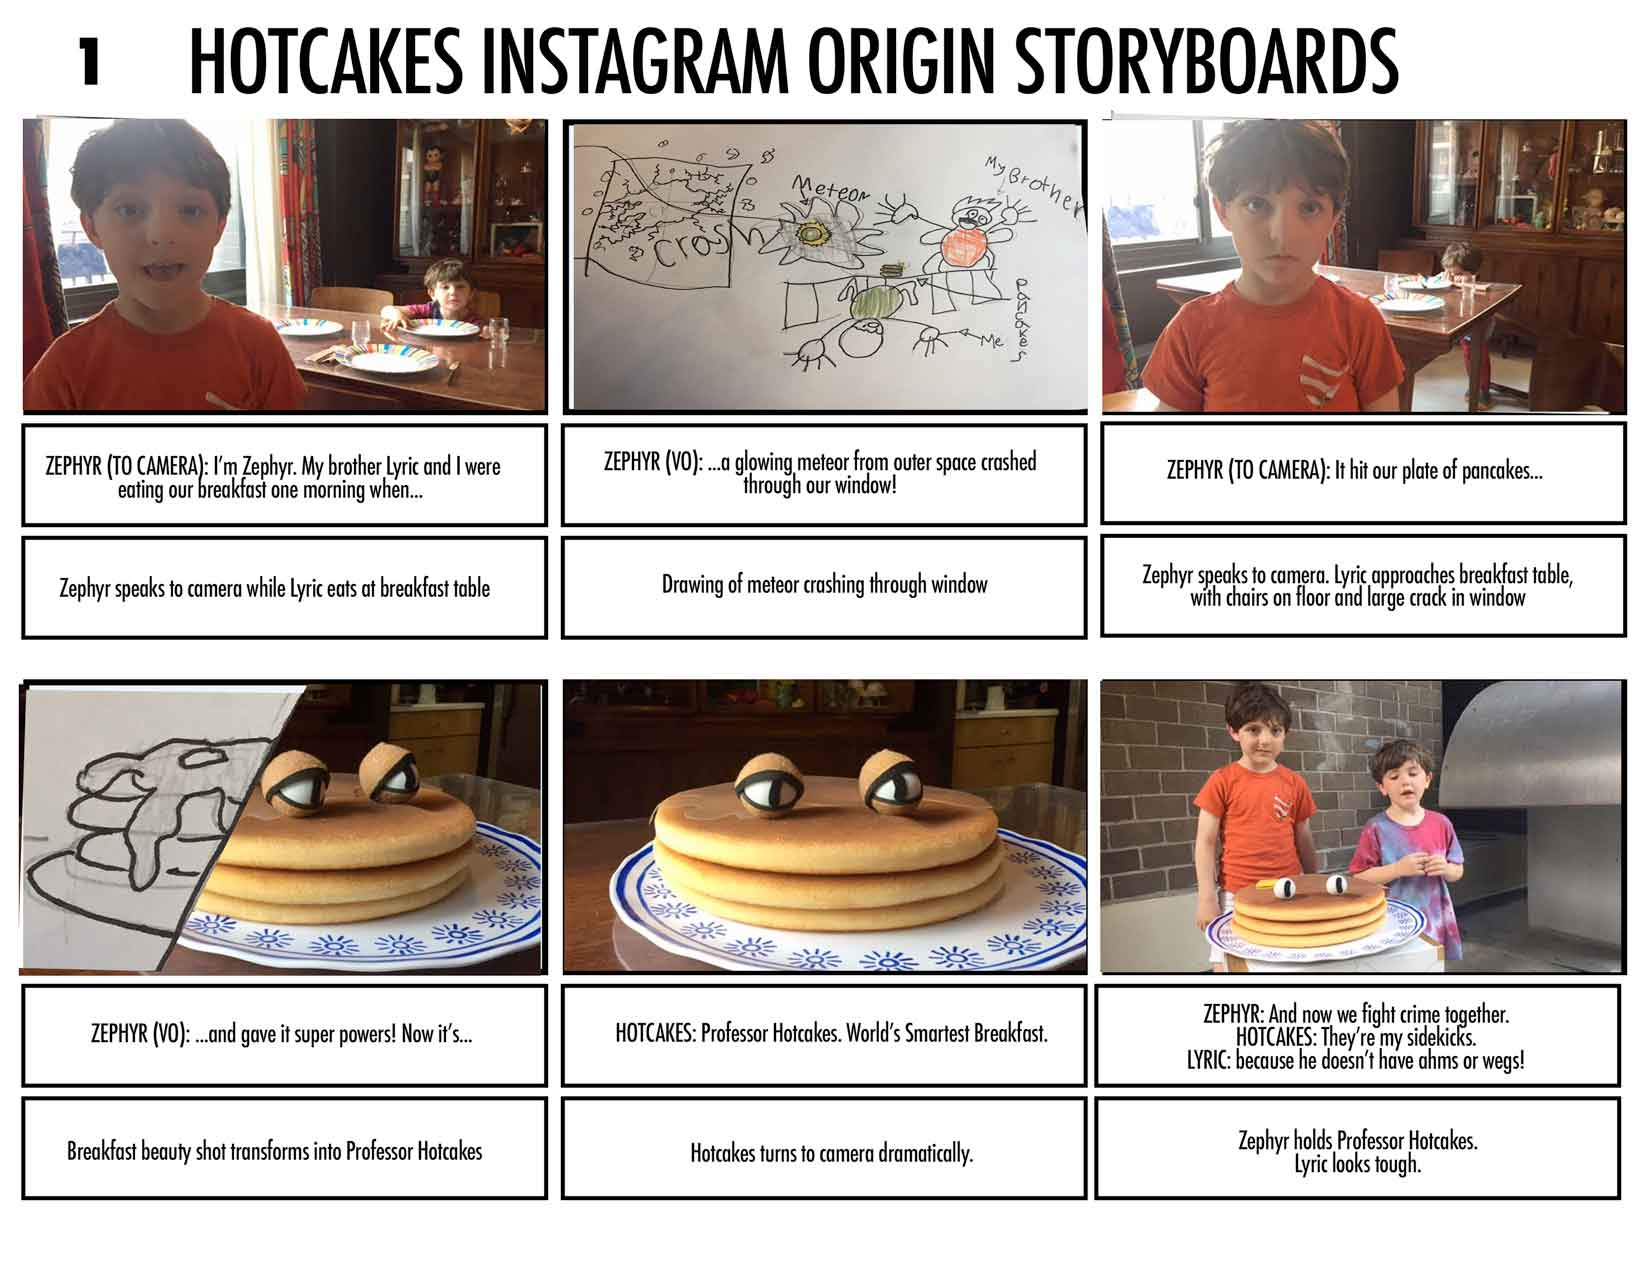 p1-HOTCAKES-IG-ORIGIN-STORYBOARDS-r2.jpg